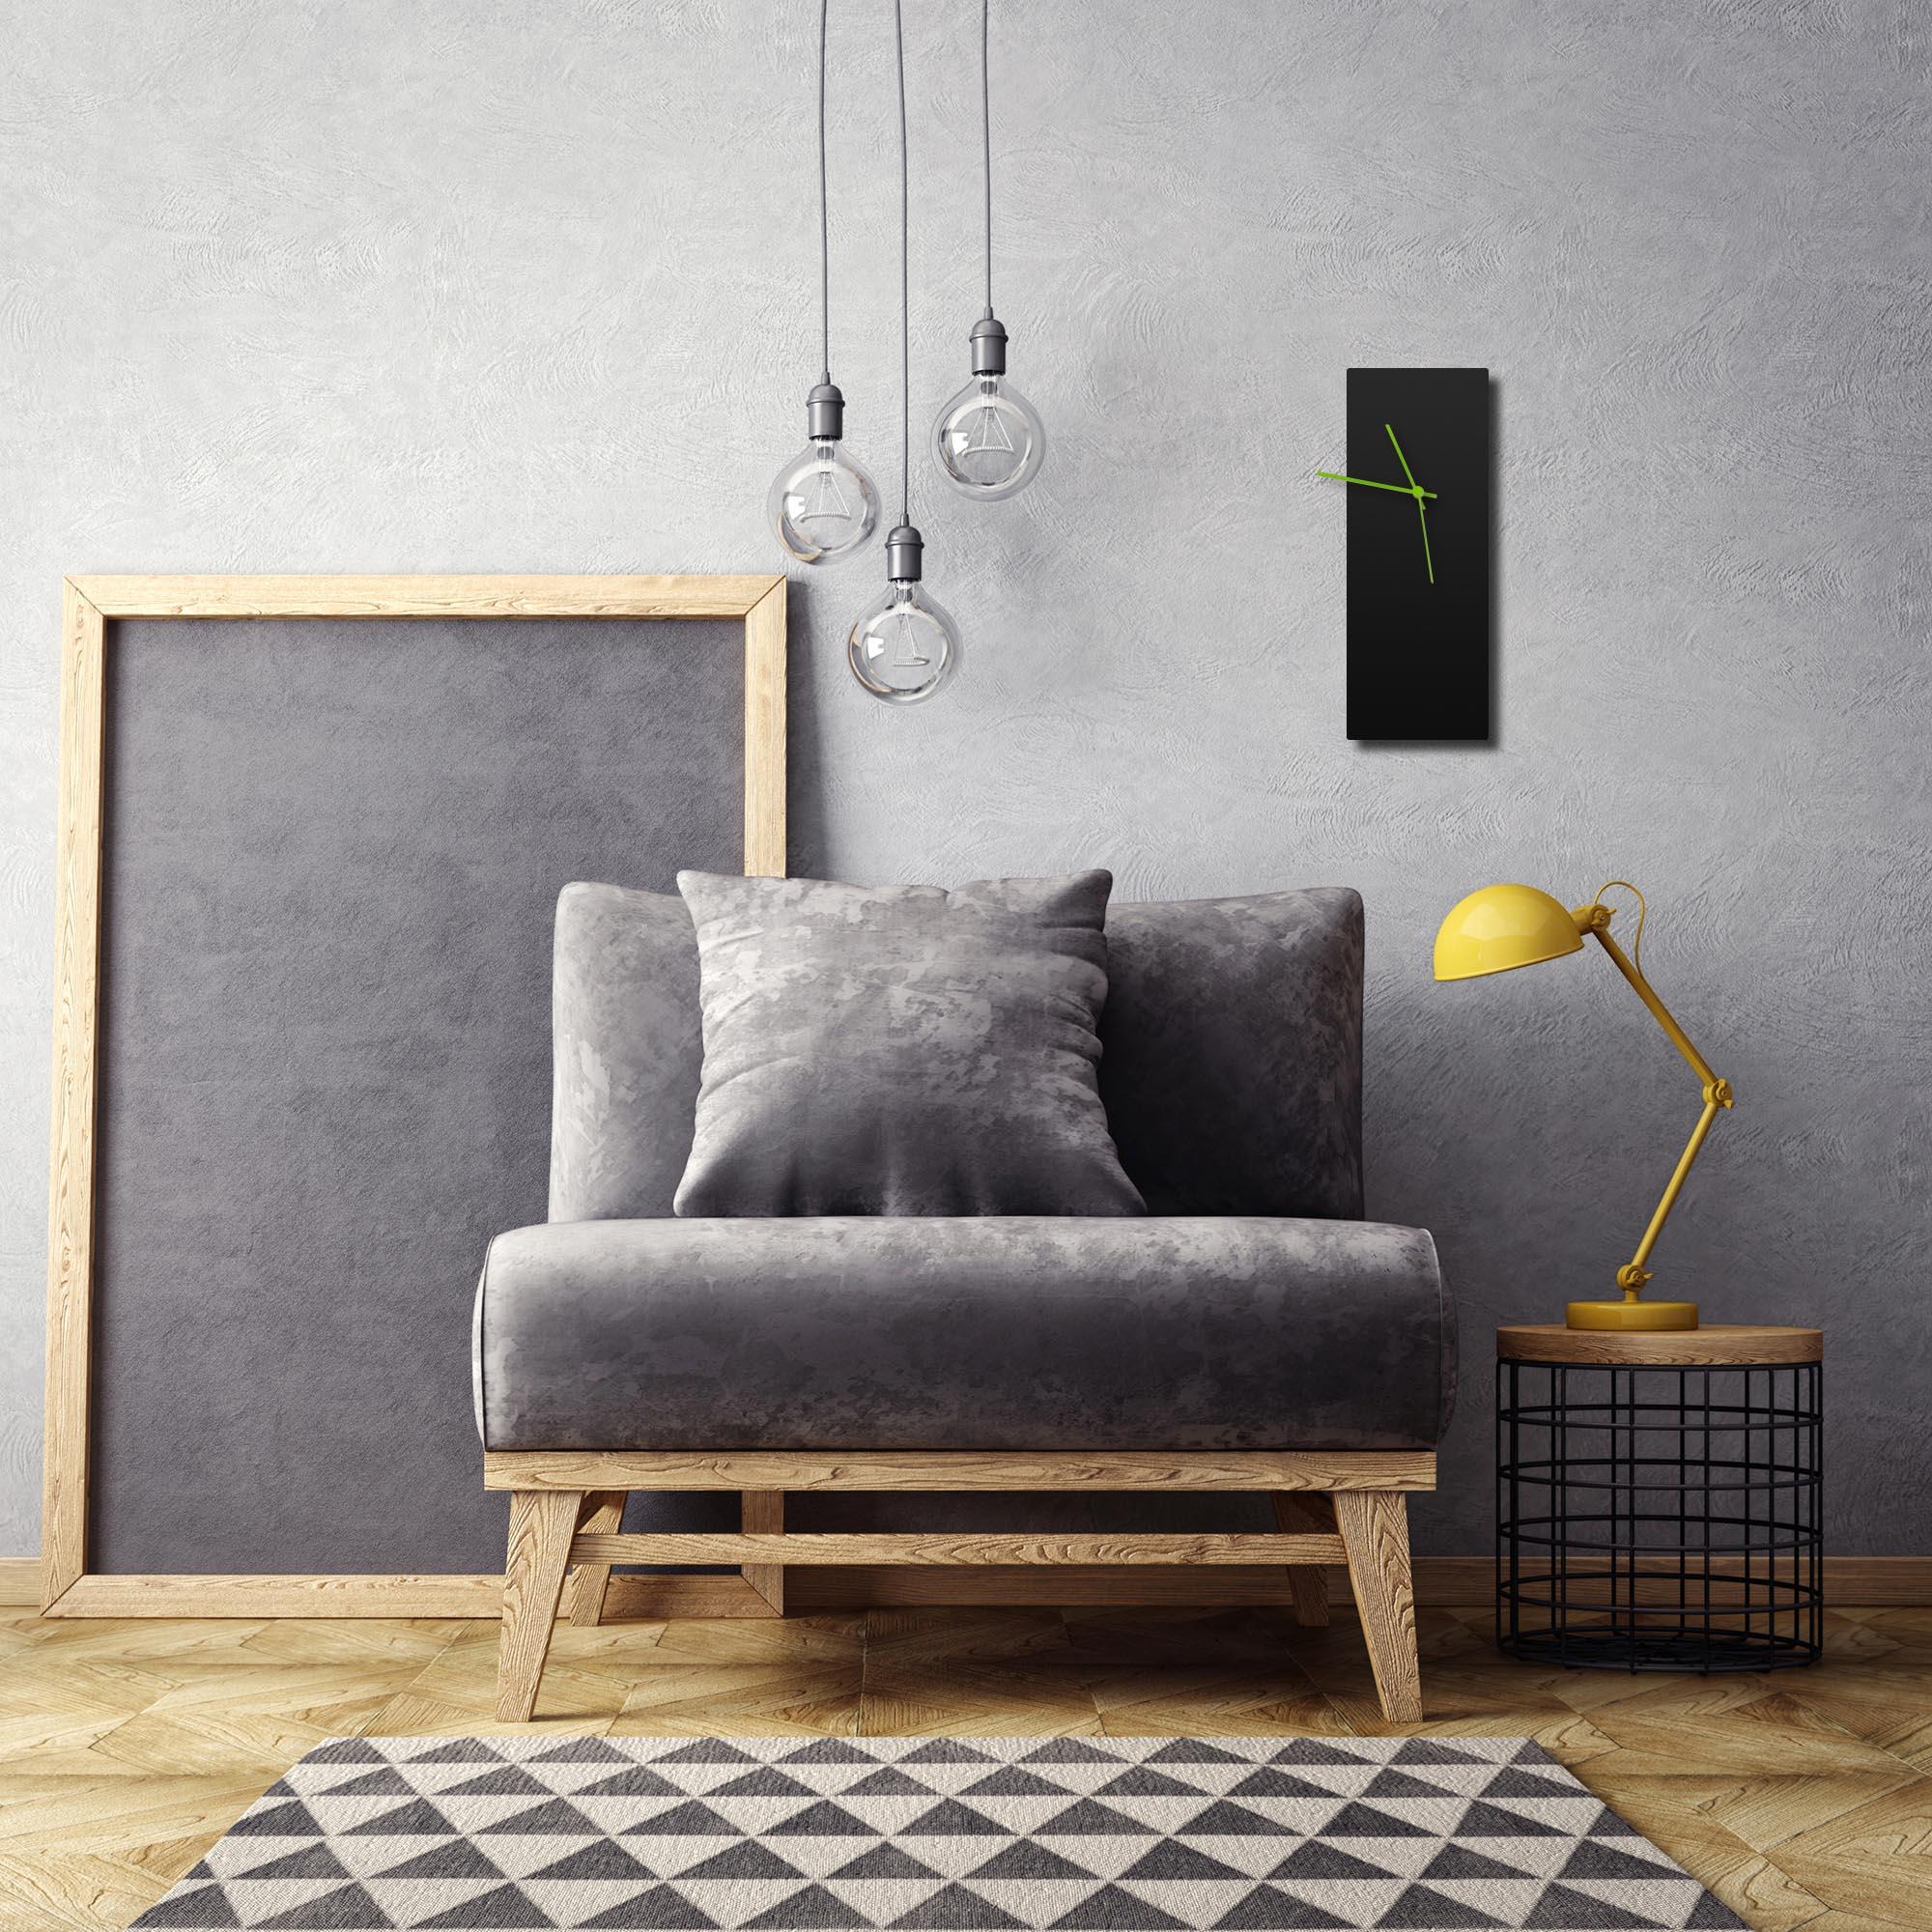 Blackout Green Clock by Adam Schwoeppe Contemporary Clock on Aluminum Polymetal - Alternate View 1